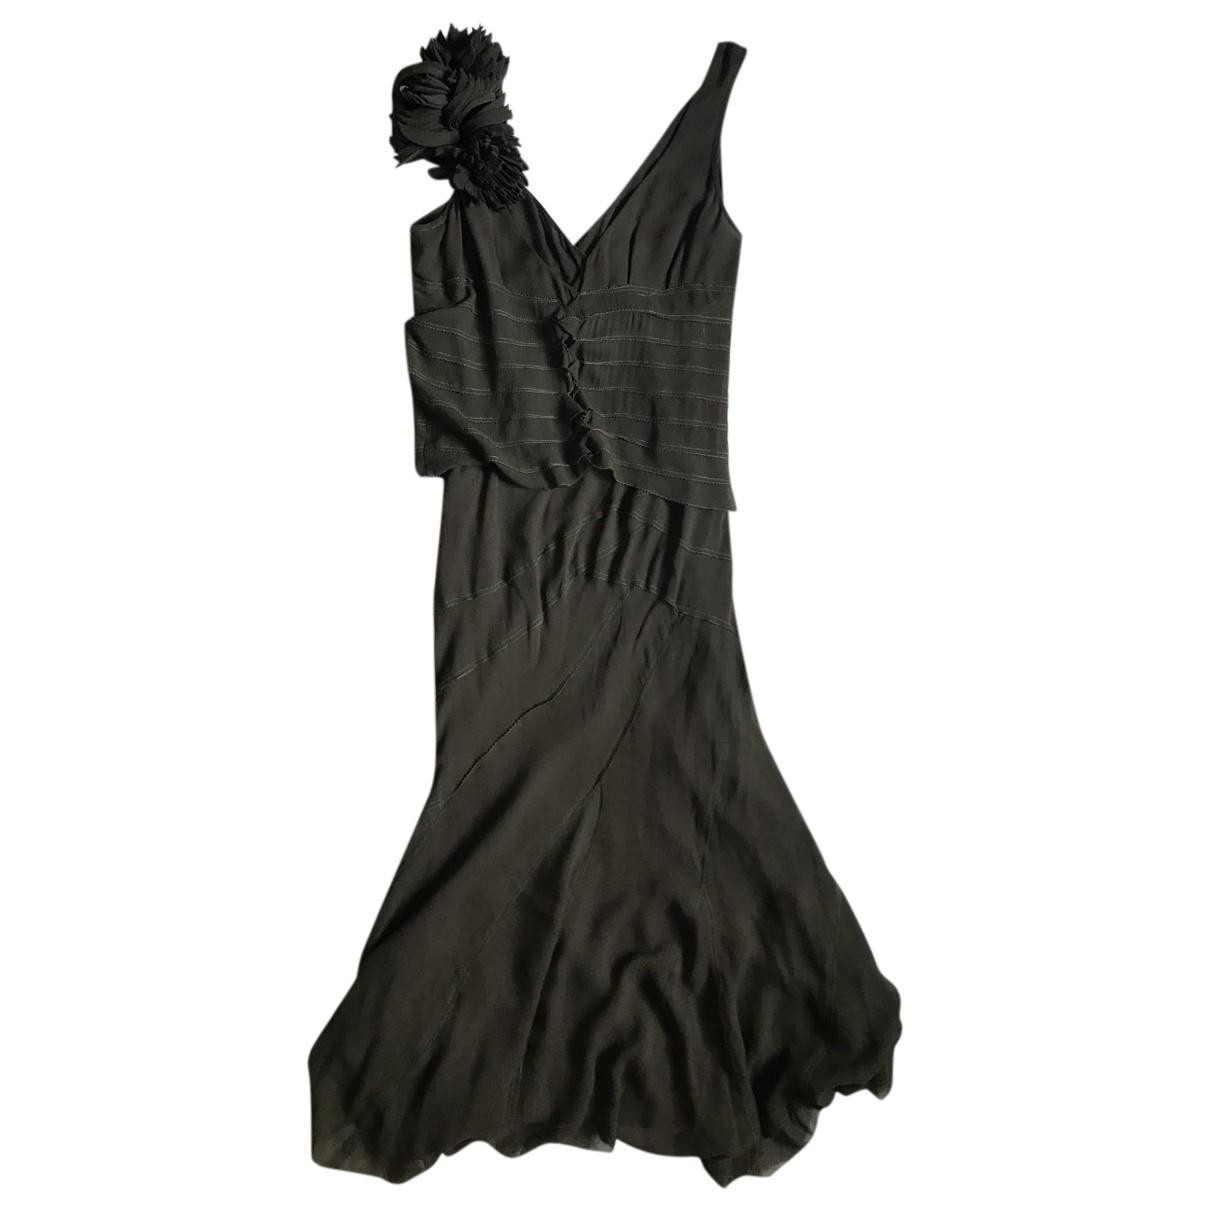 Dkny \N Kleid in  Khaki Seide